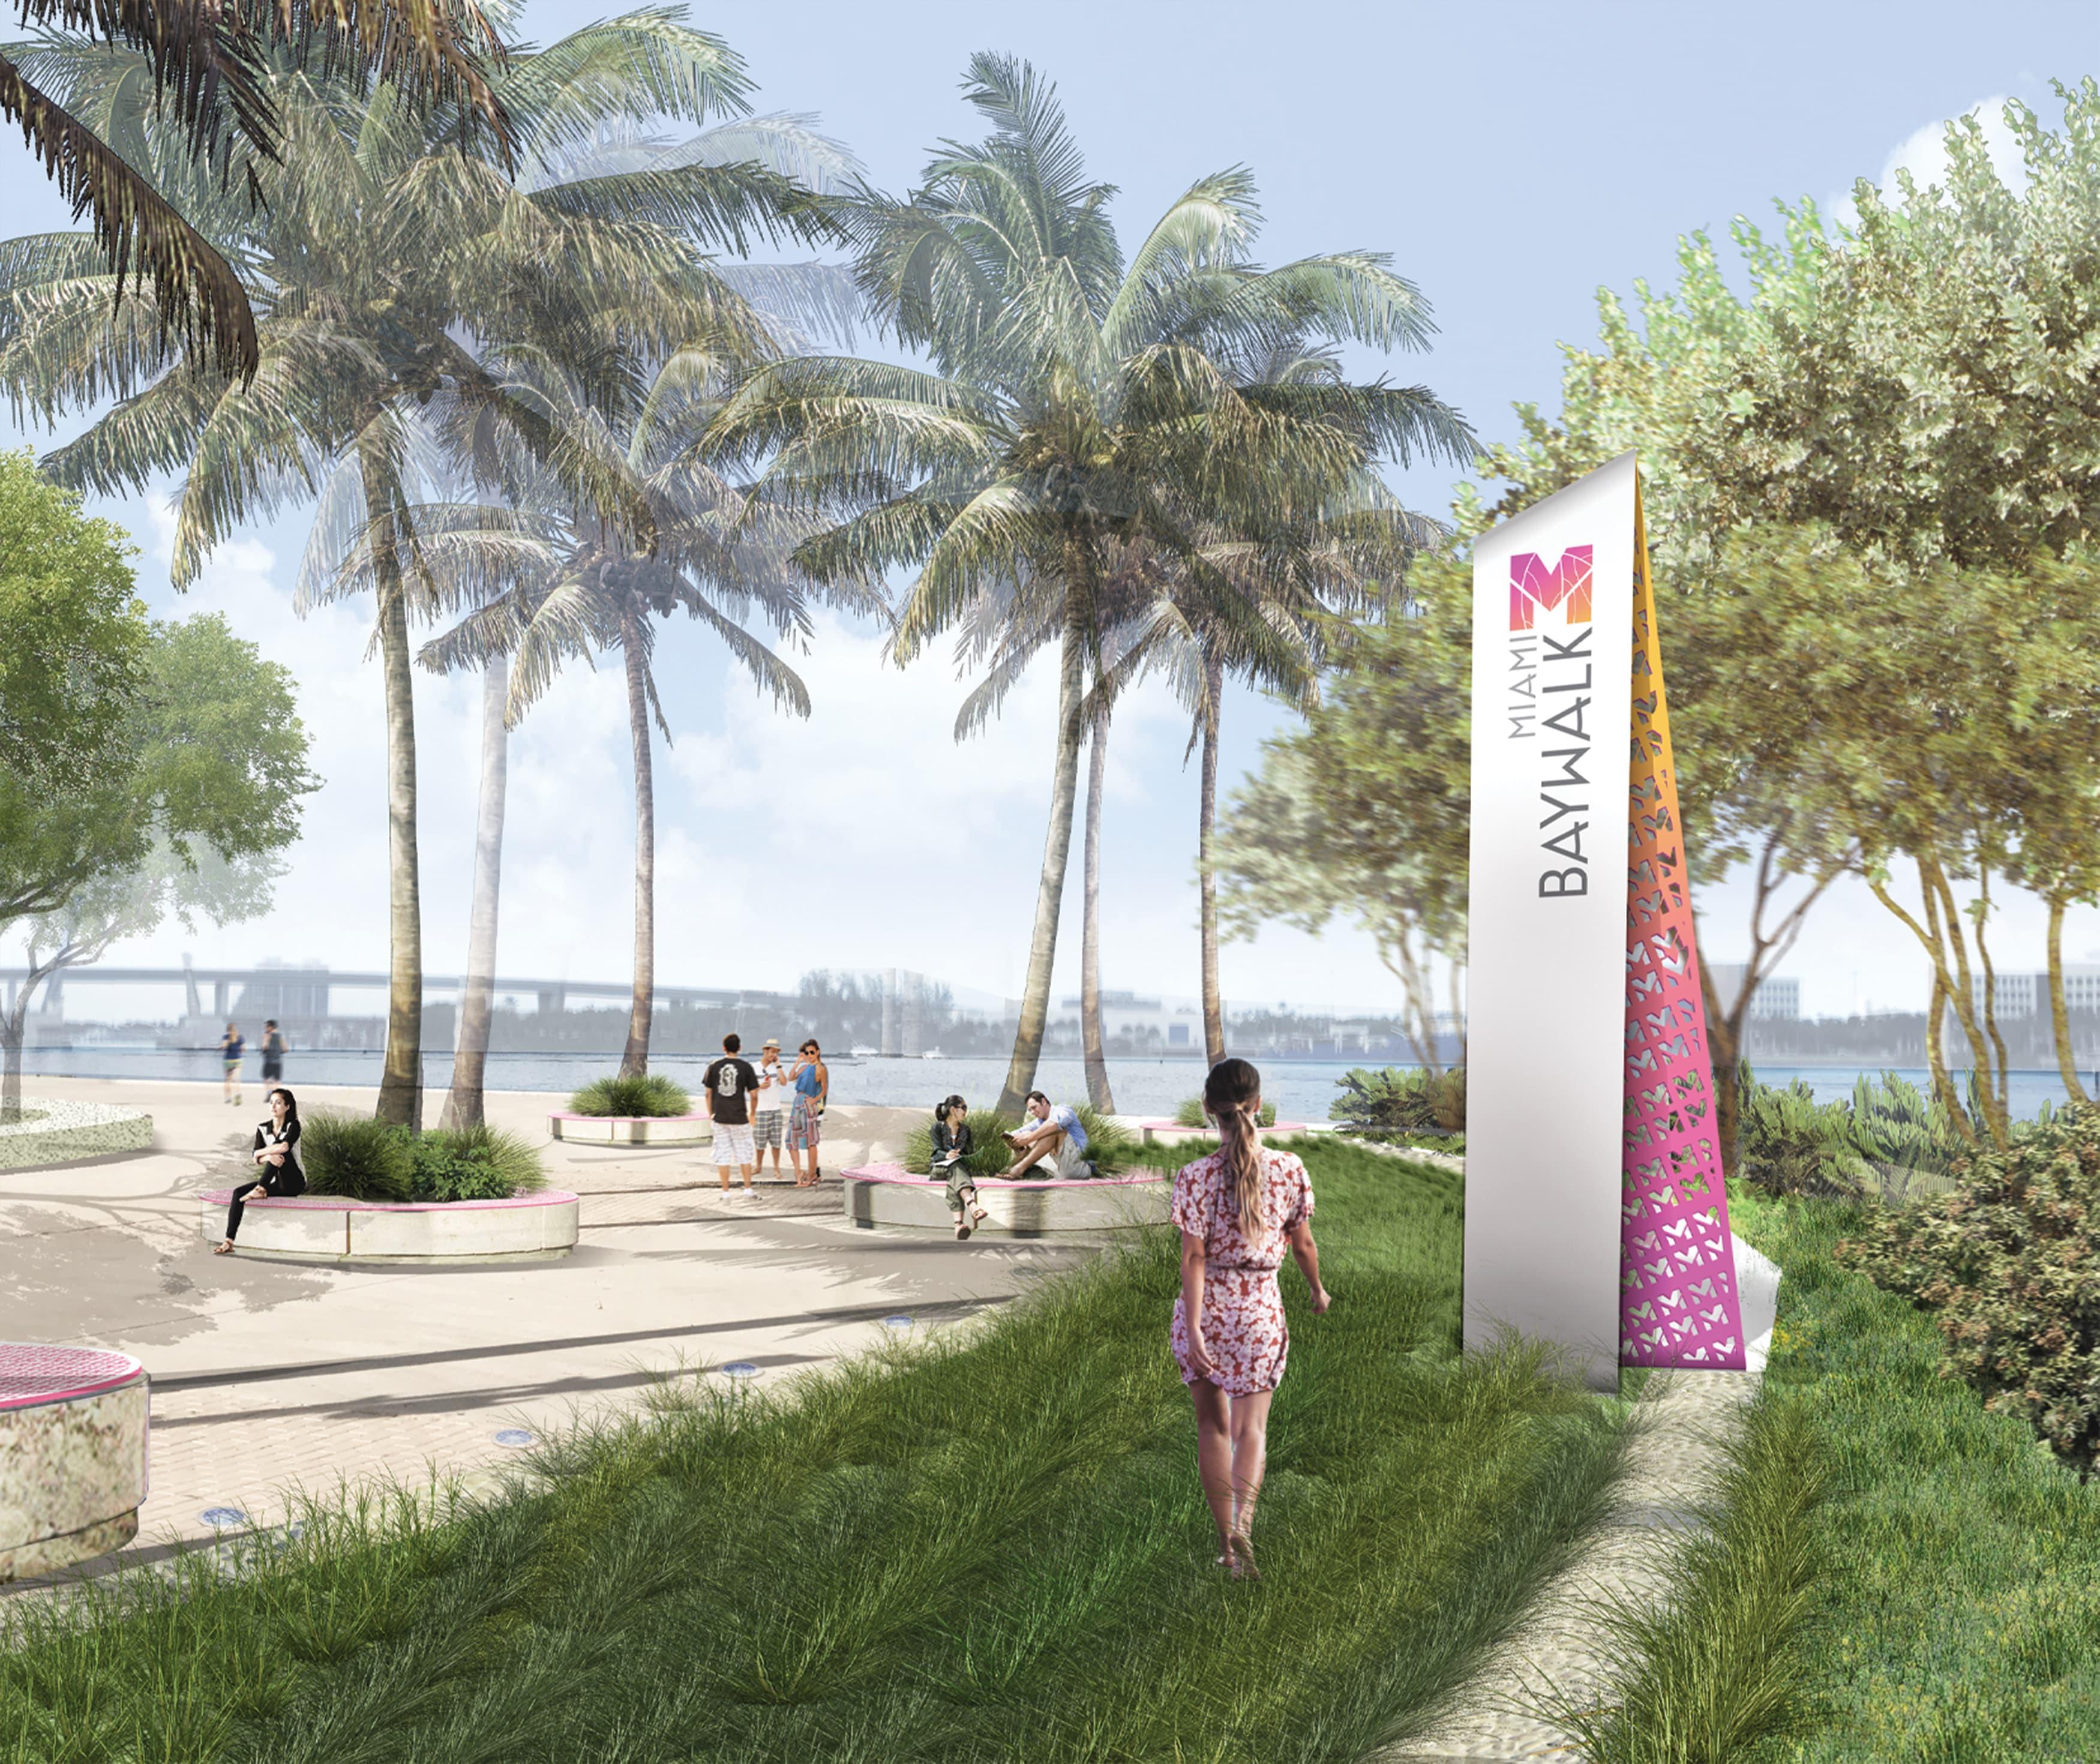 Civic Design, Transit Design, Waterfront Wayfinding Design, Streetscape Design, Park Wayfinding & Signage.